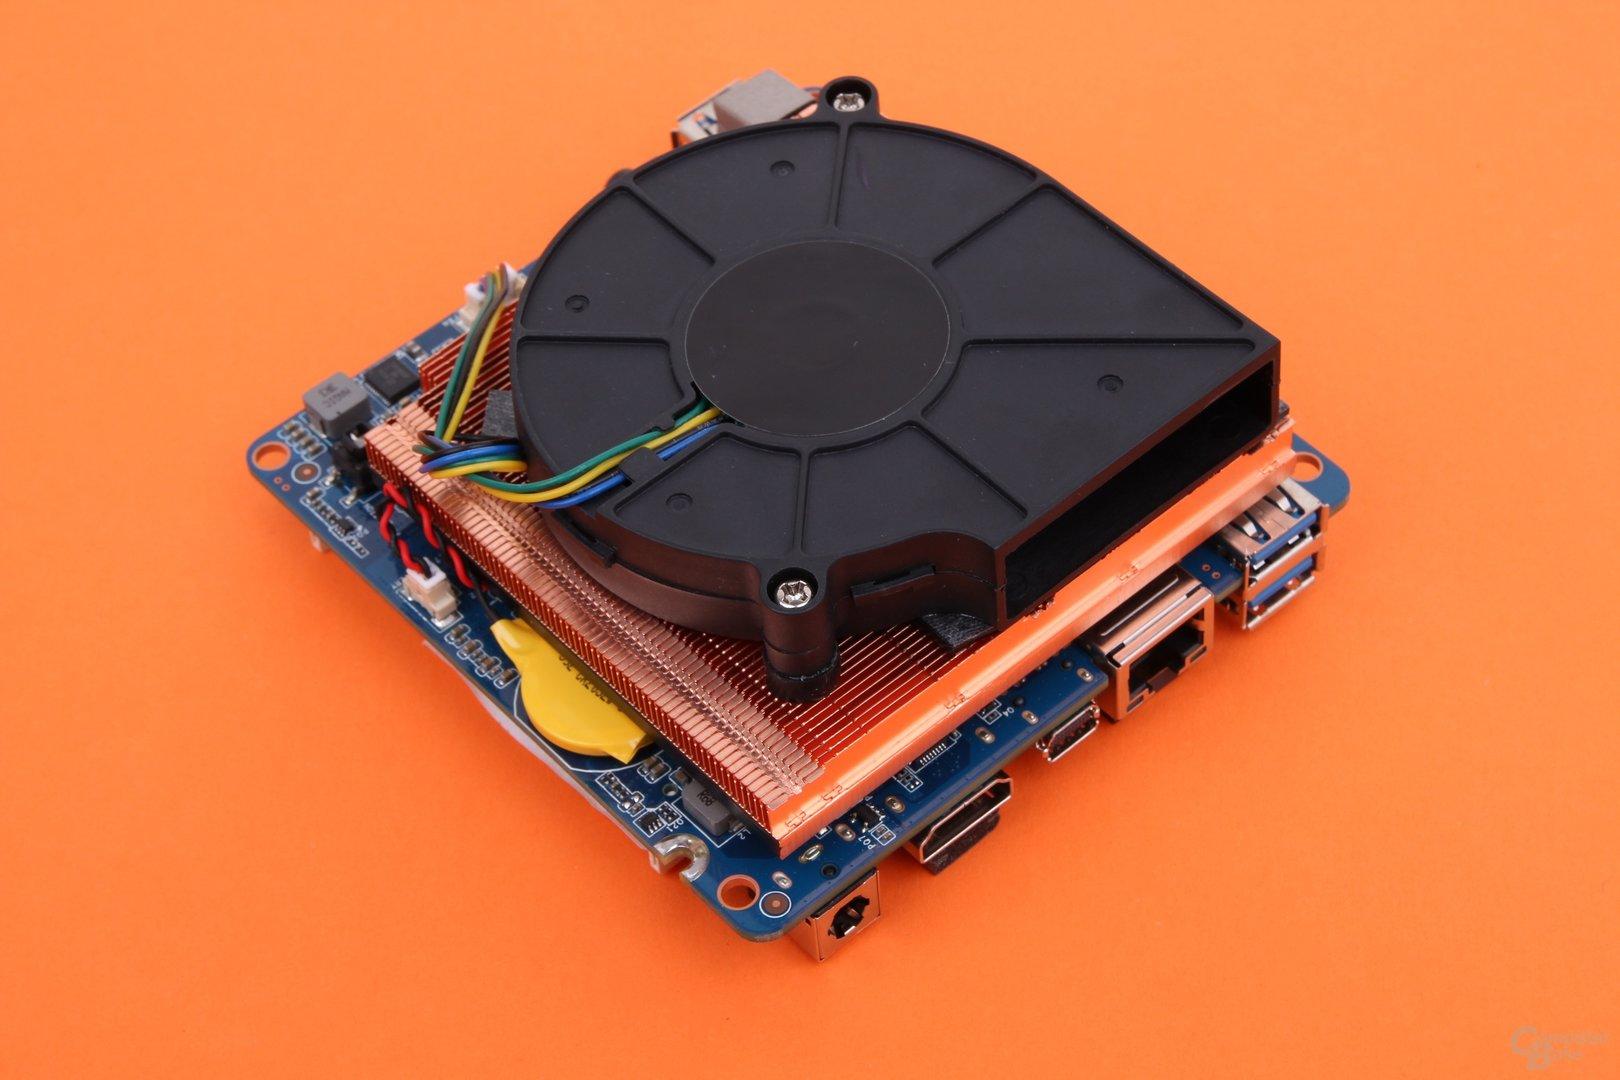 Gigabyte Brix Pro GB-BXi7-4770R – Mainboard